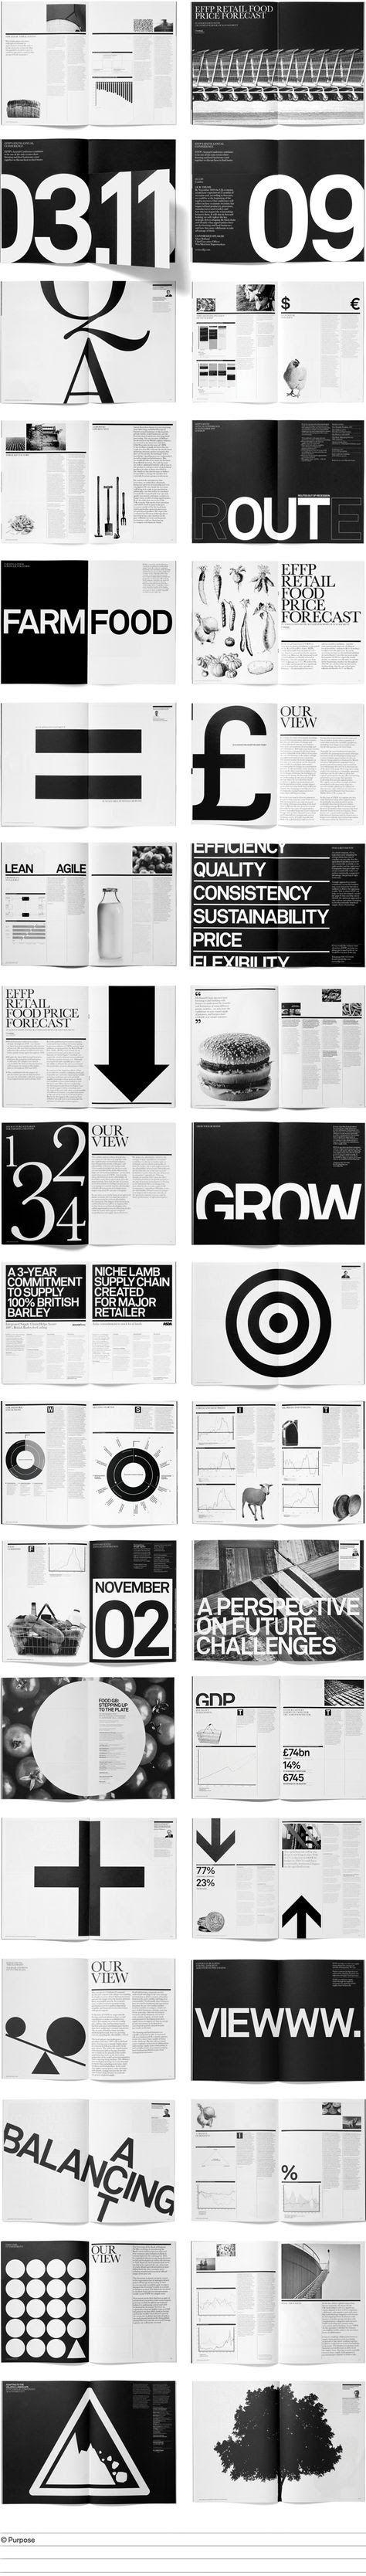 Design Book, Ebook Interior Or Layout